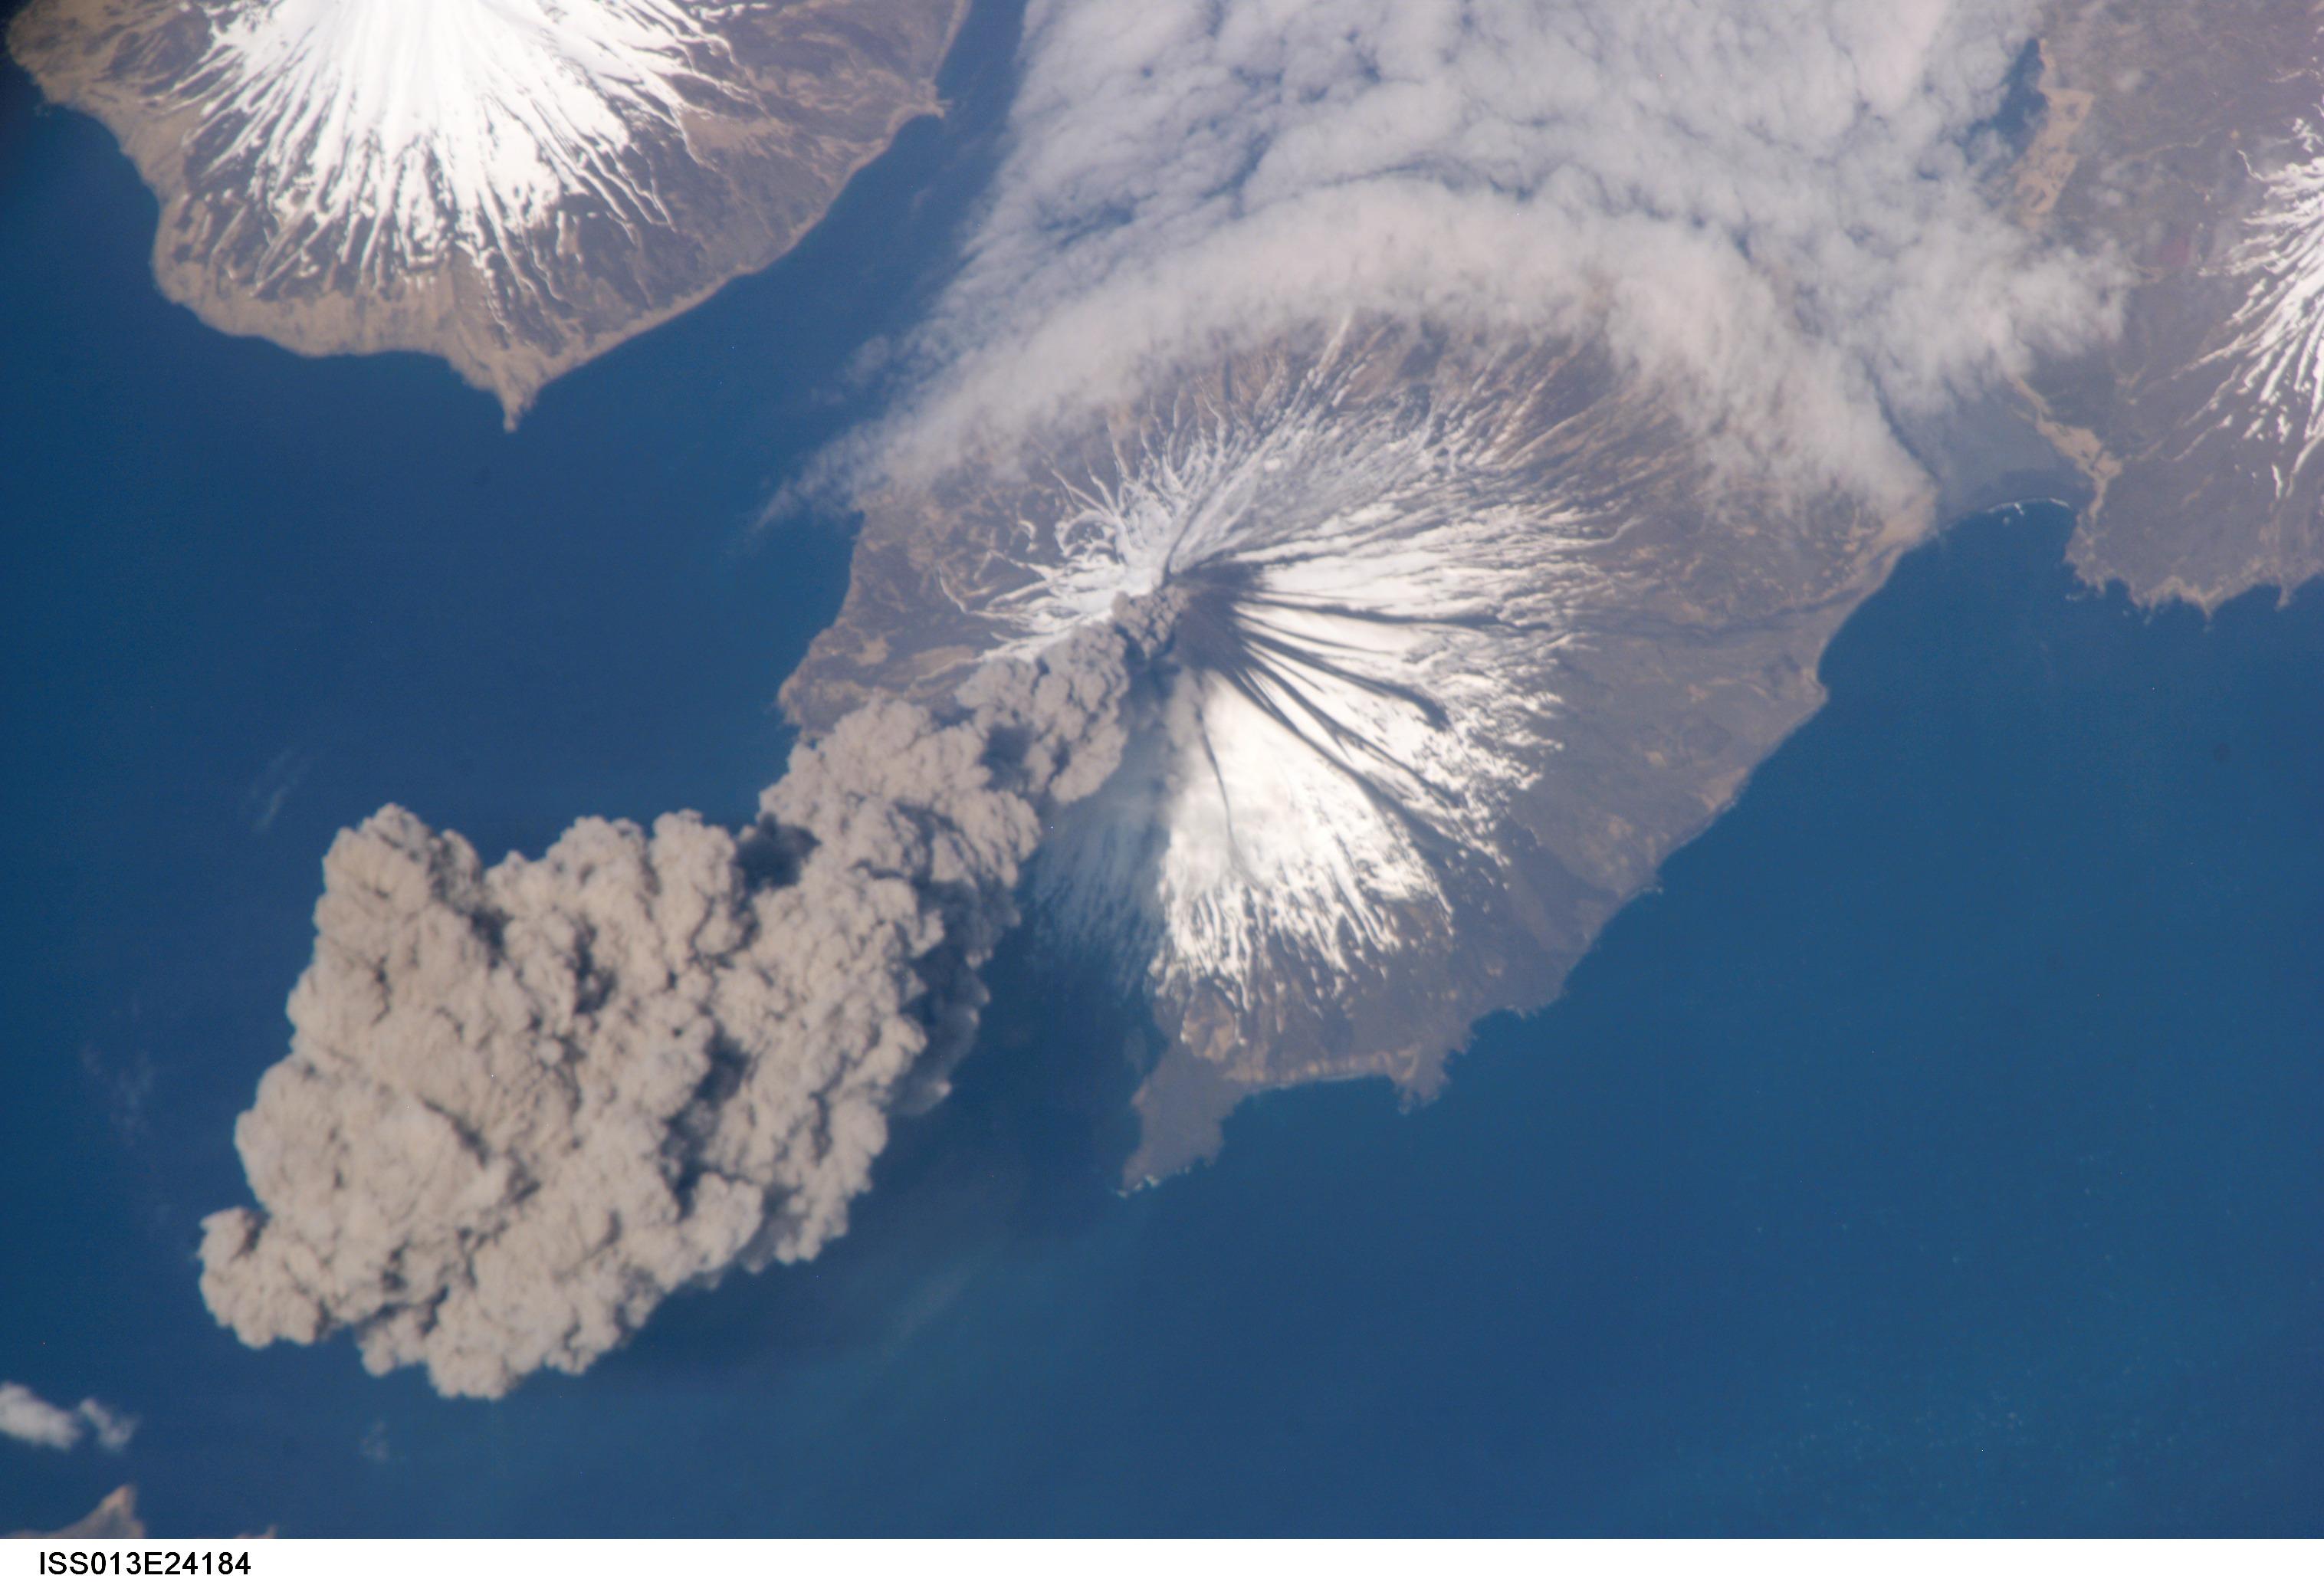 File:Mount cleveland erupting2.jpg - Wikimedia Commons